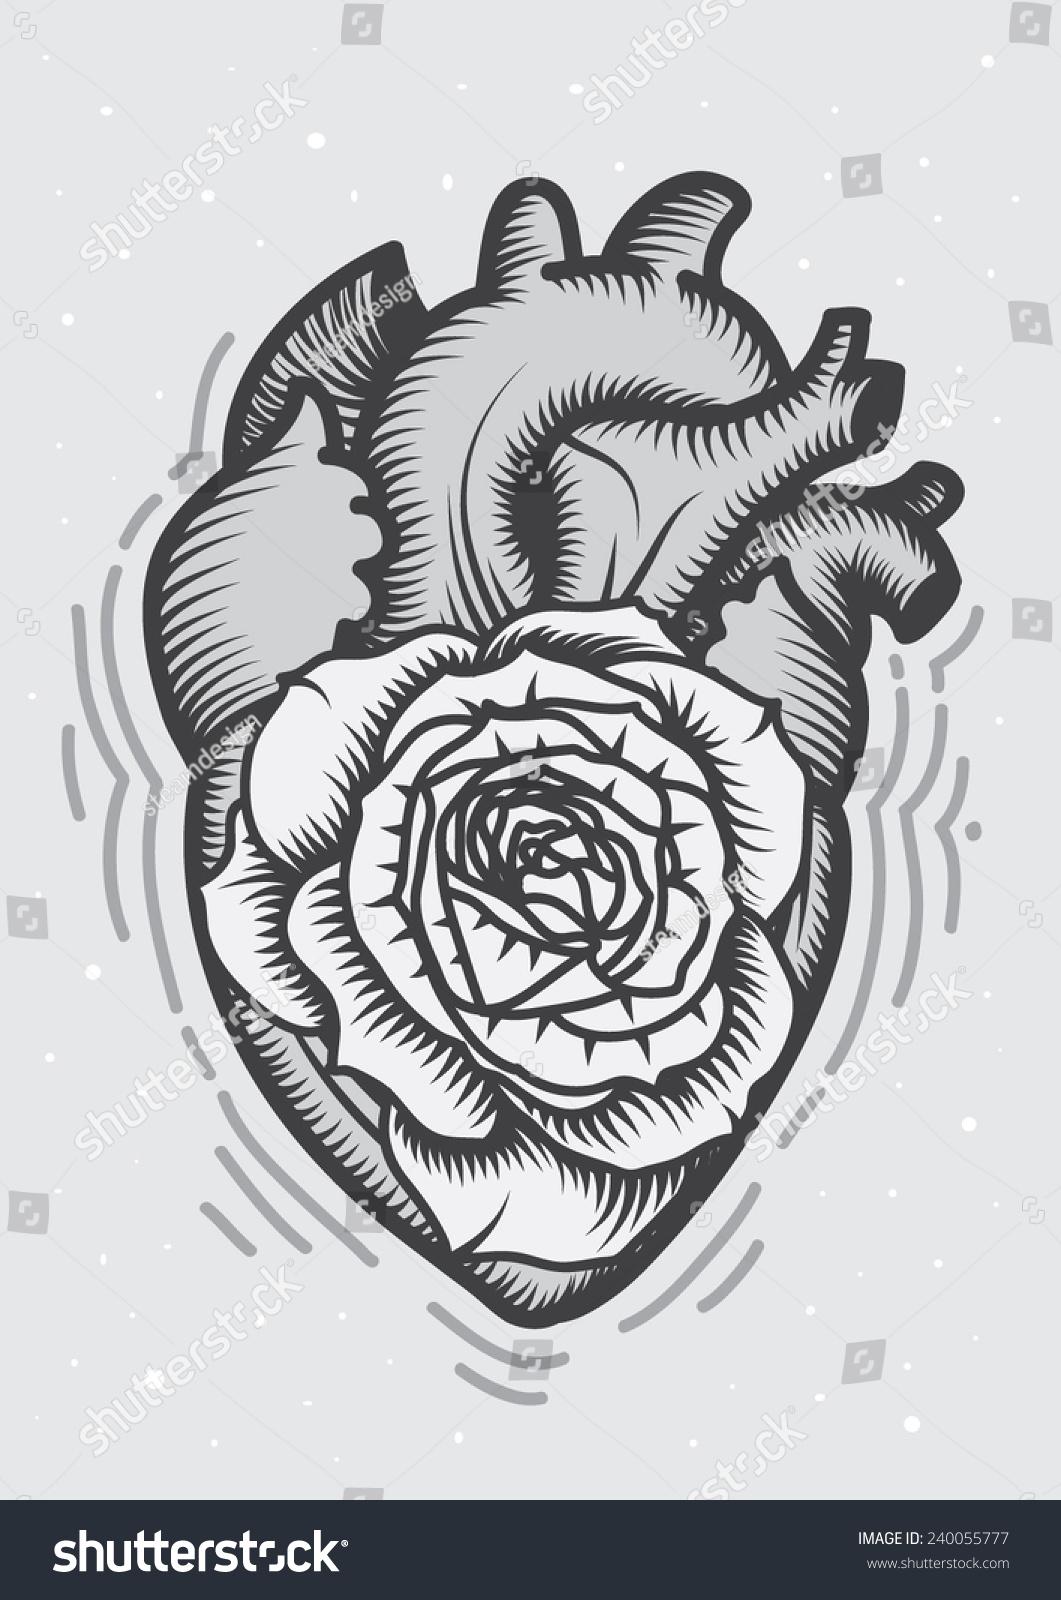 Anatomy Drawing Heart Rose Inside Stock Vector 240055777 - Shutterstock